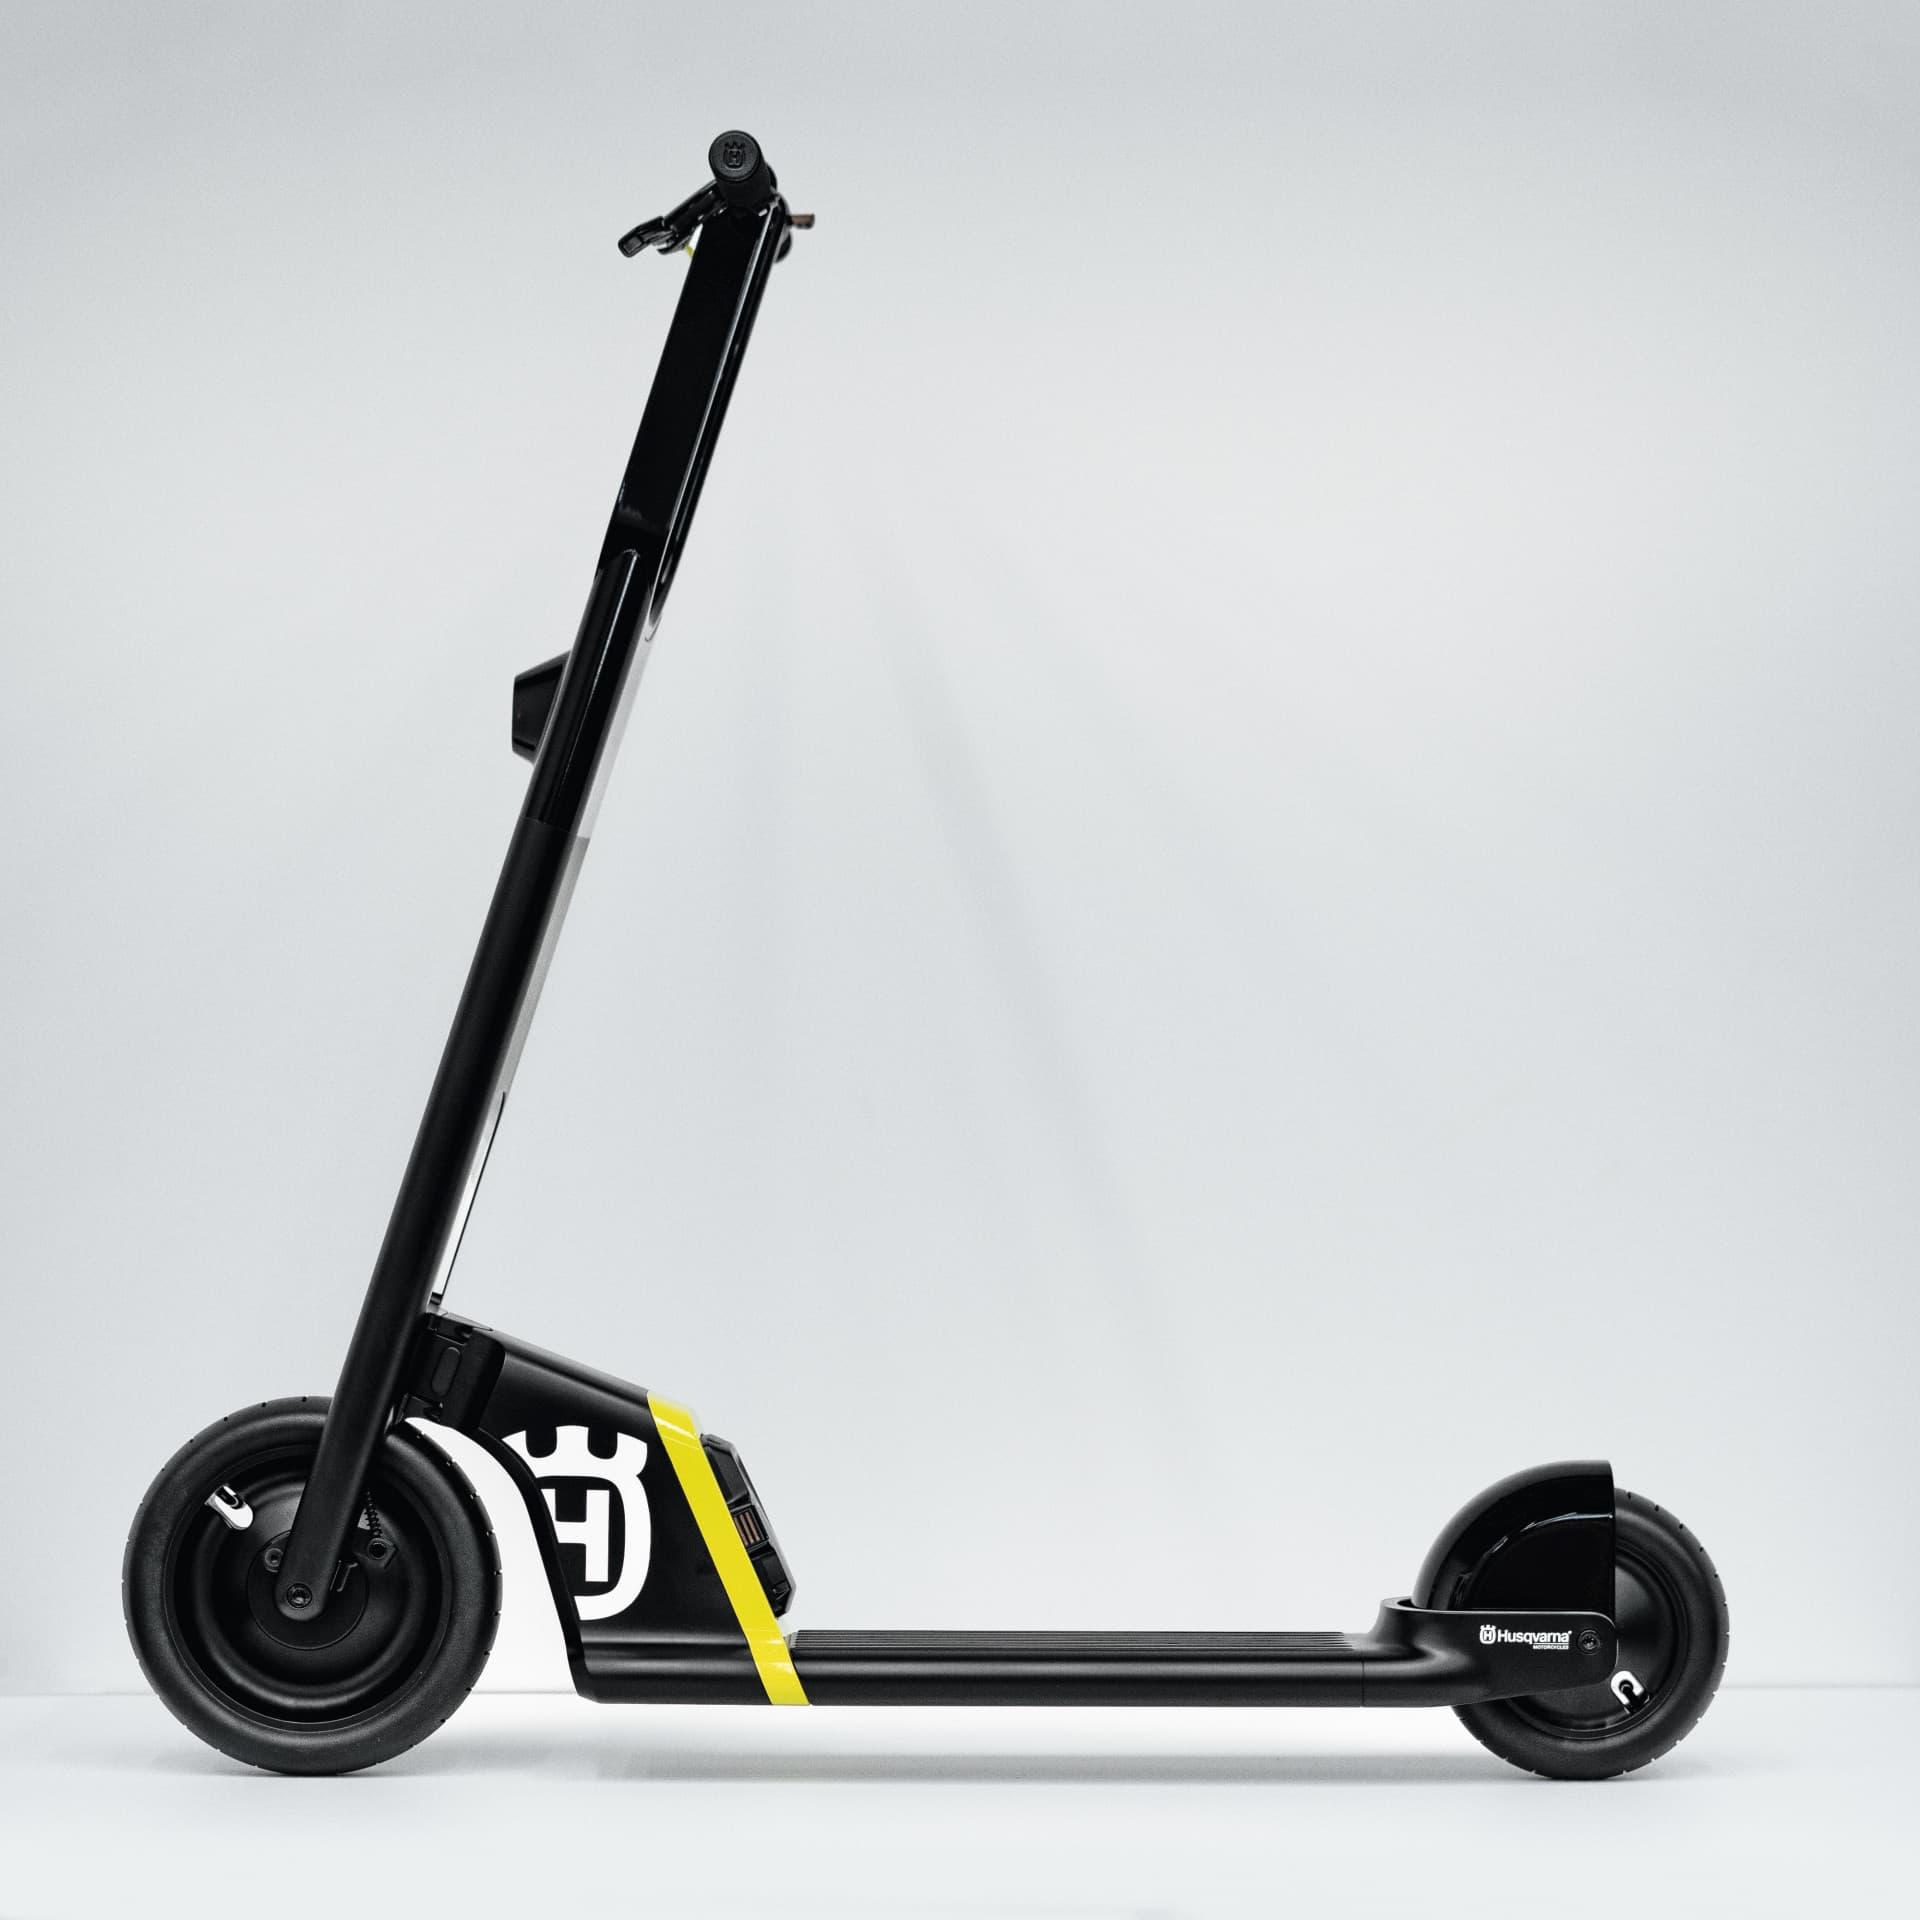 Husqvarna Bltz Concept Patinete Electrico 02